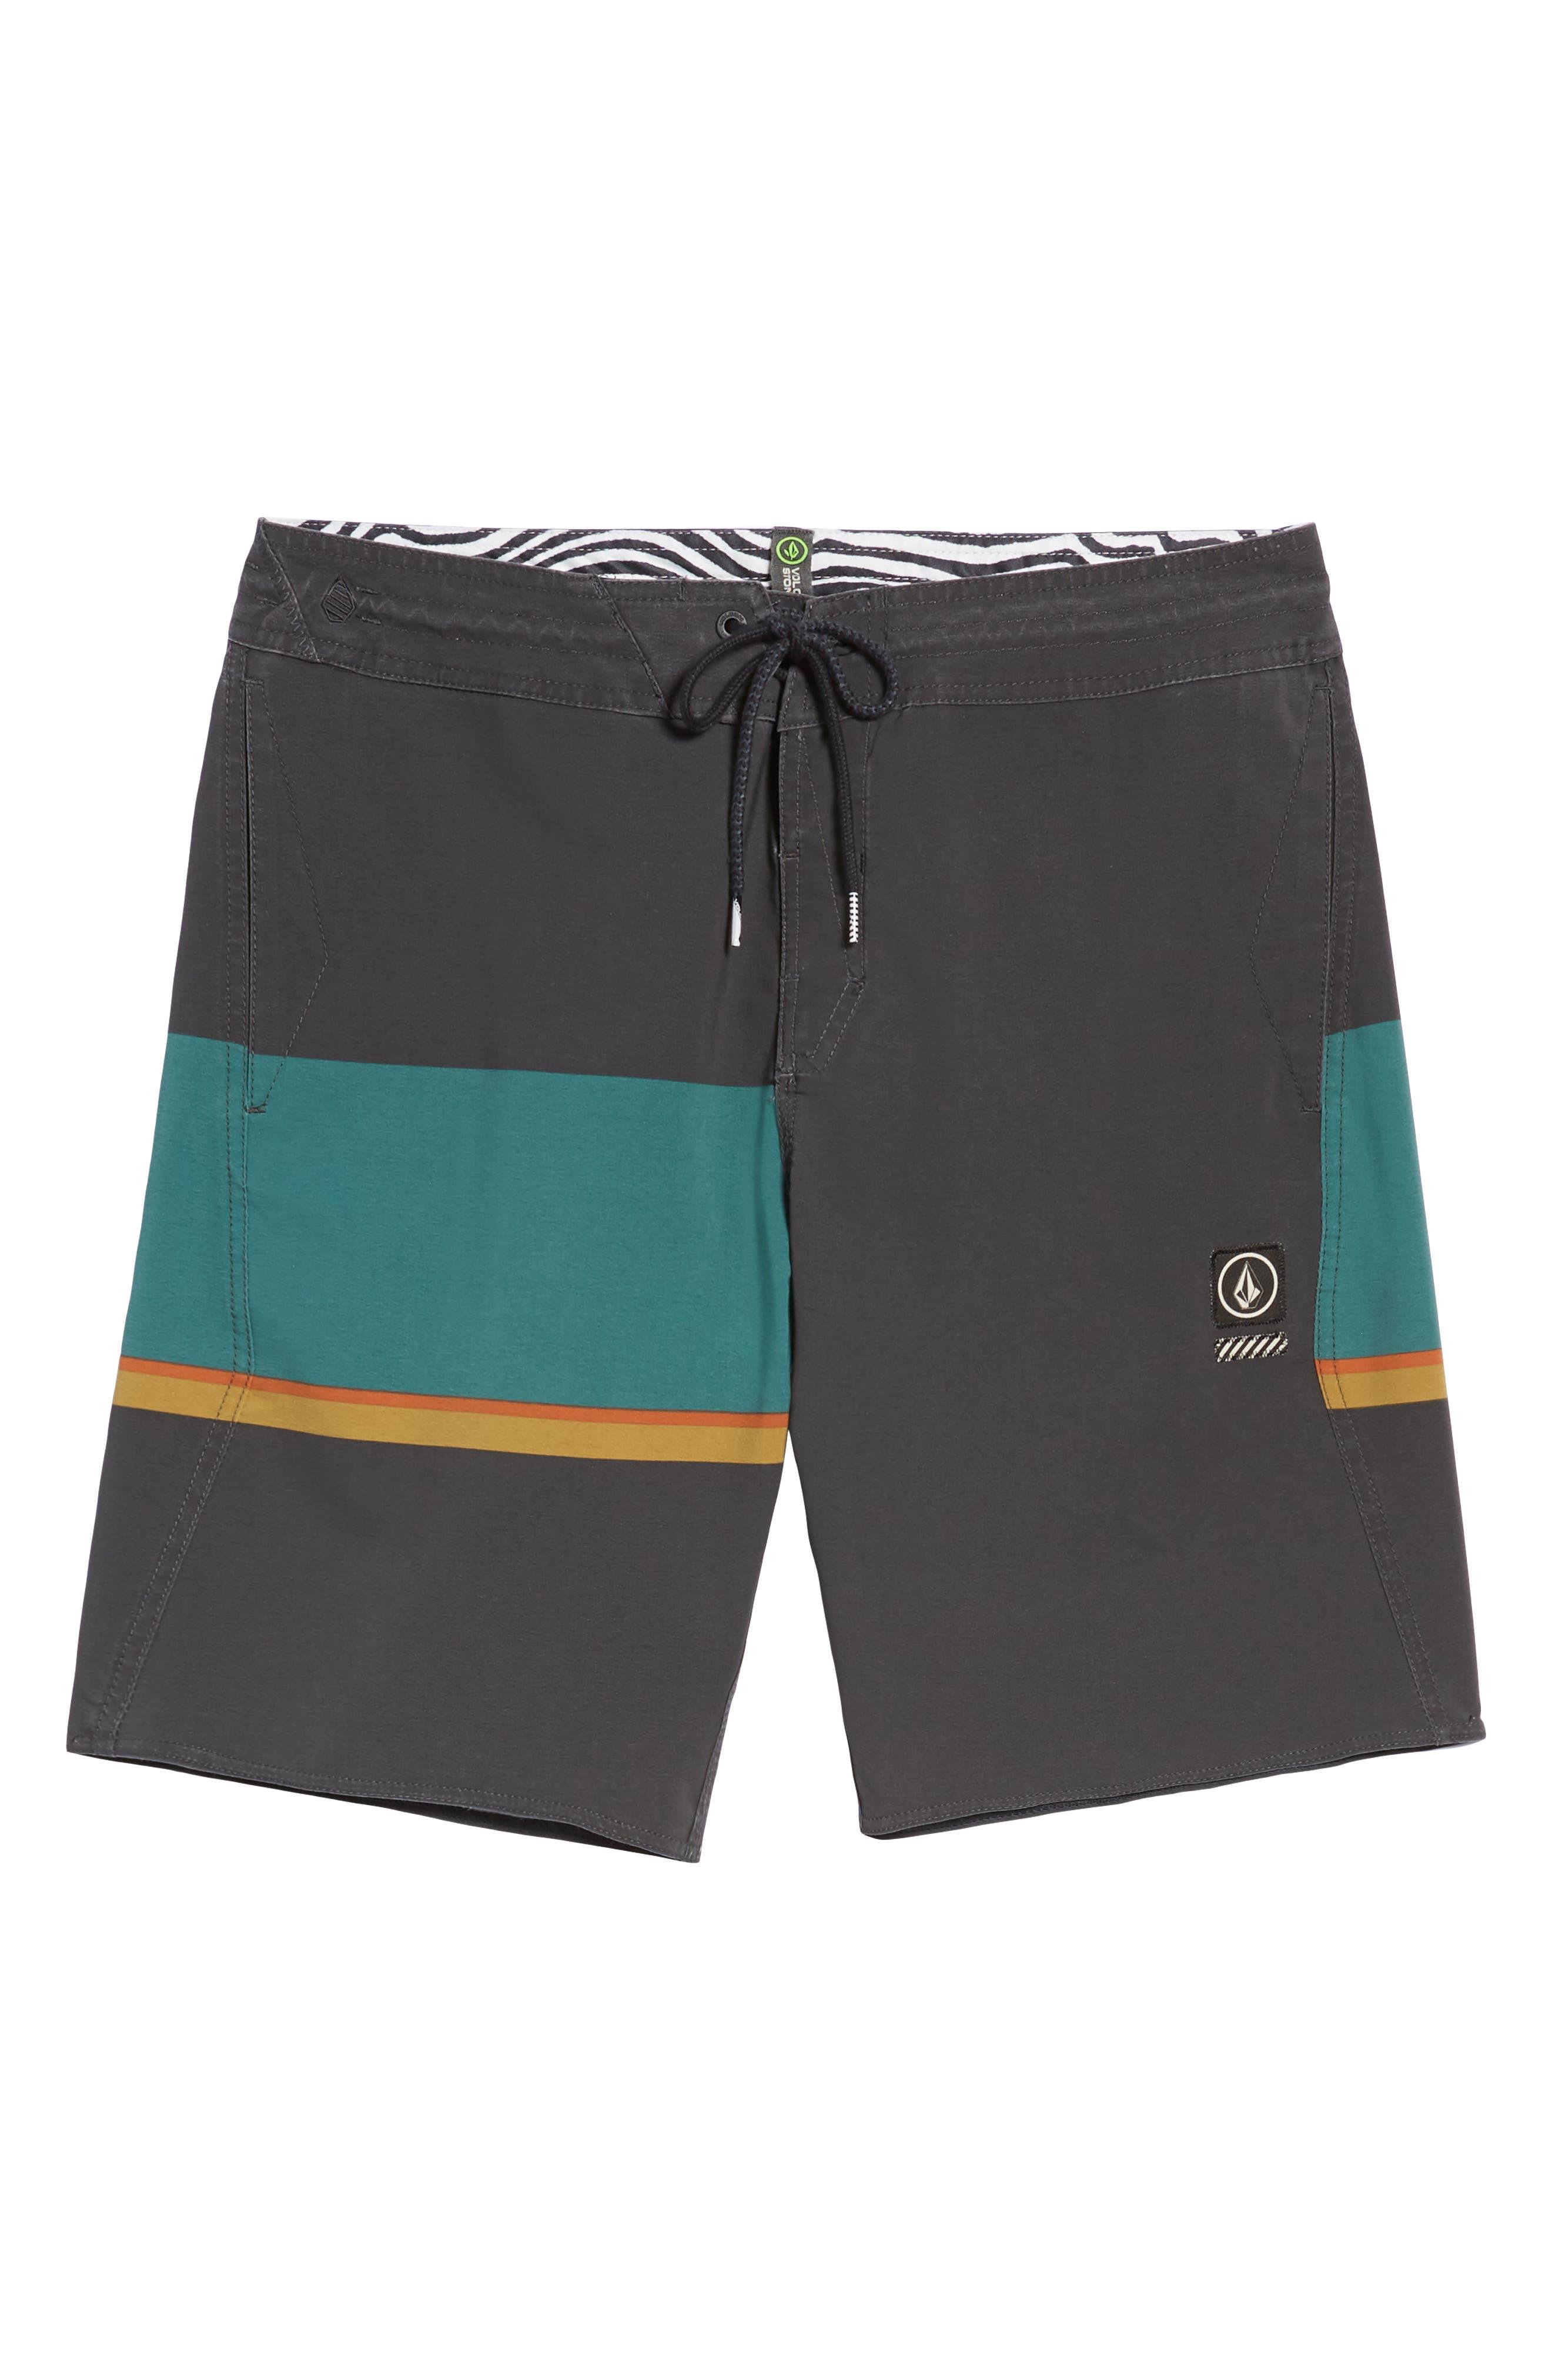 VOLCOM,                             3 Quarta Stoney Board Shorts,                             Alternate thumbnail 6, color,                             366